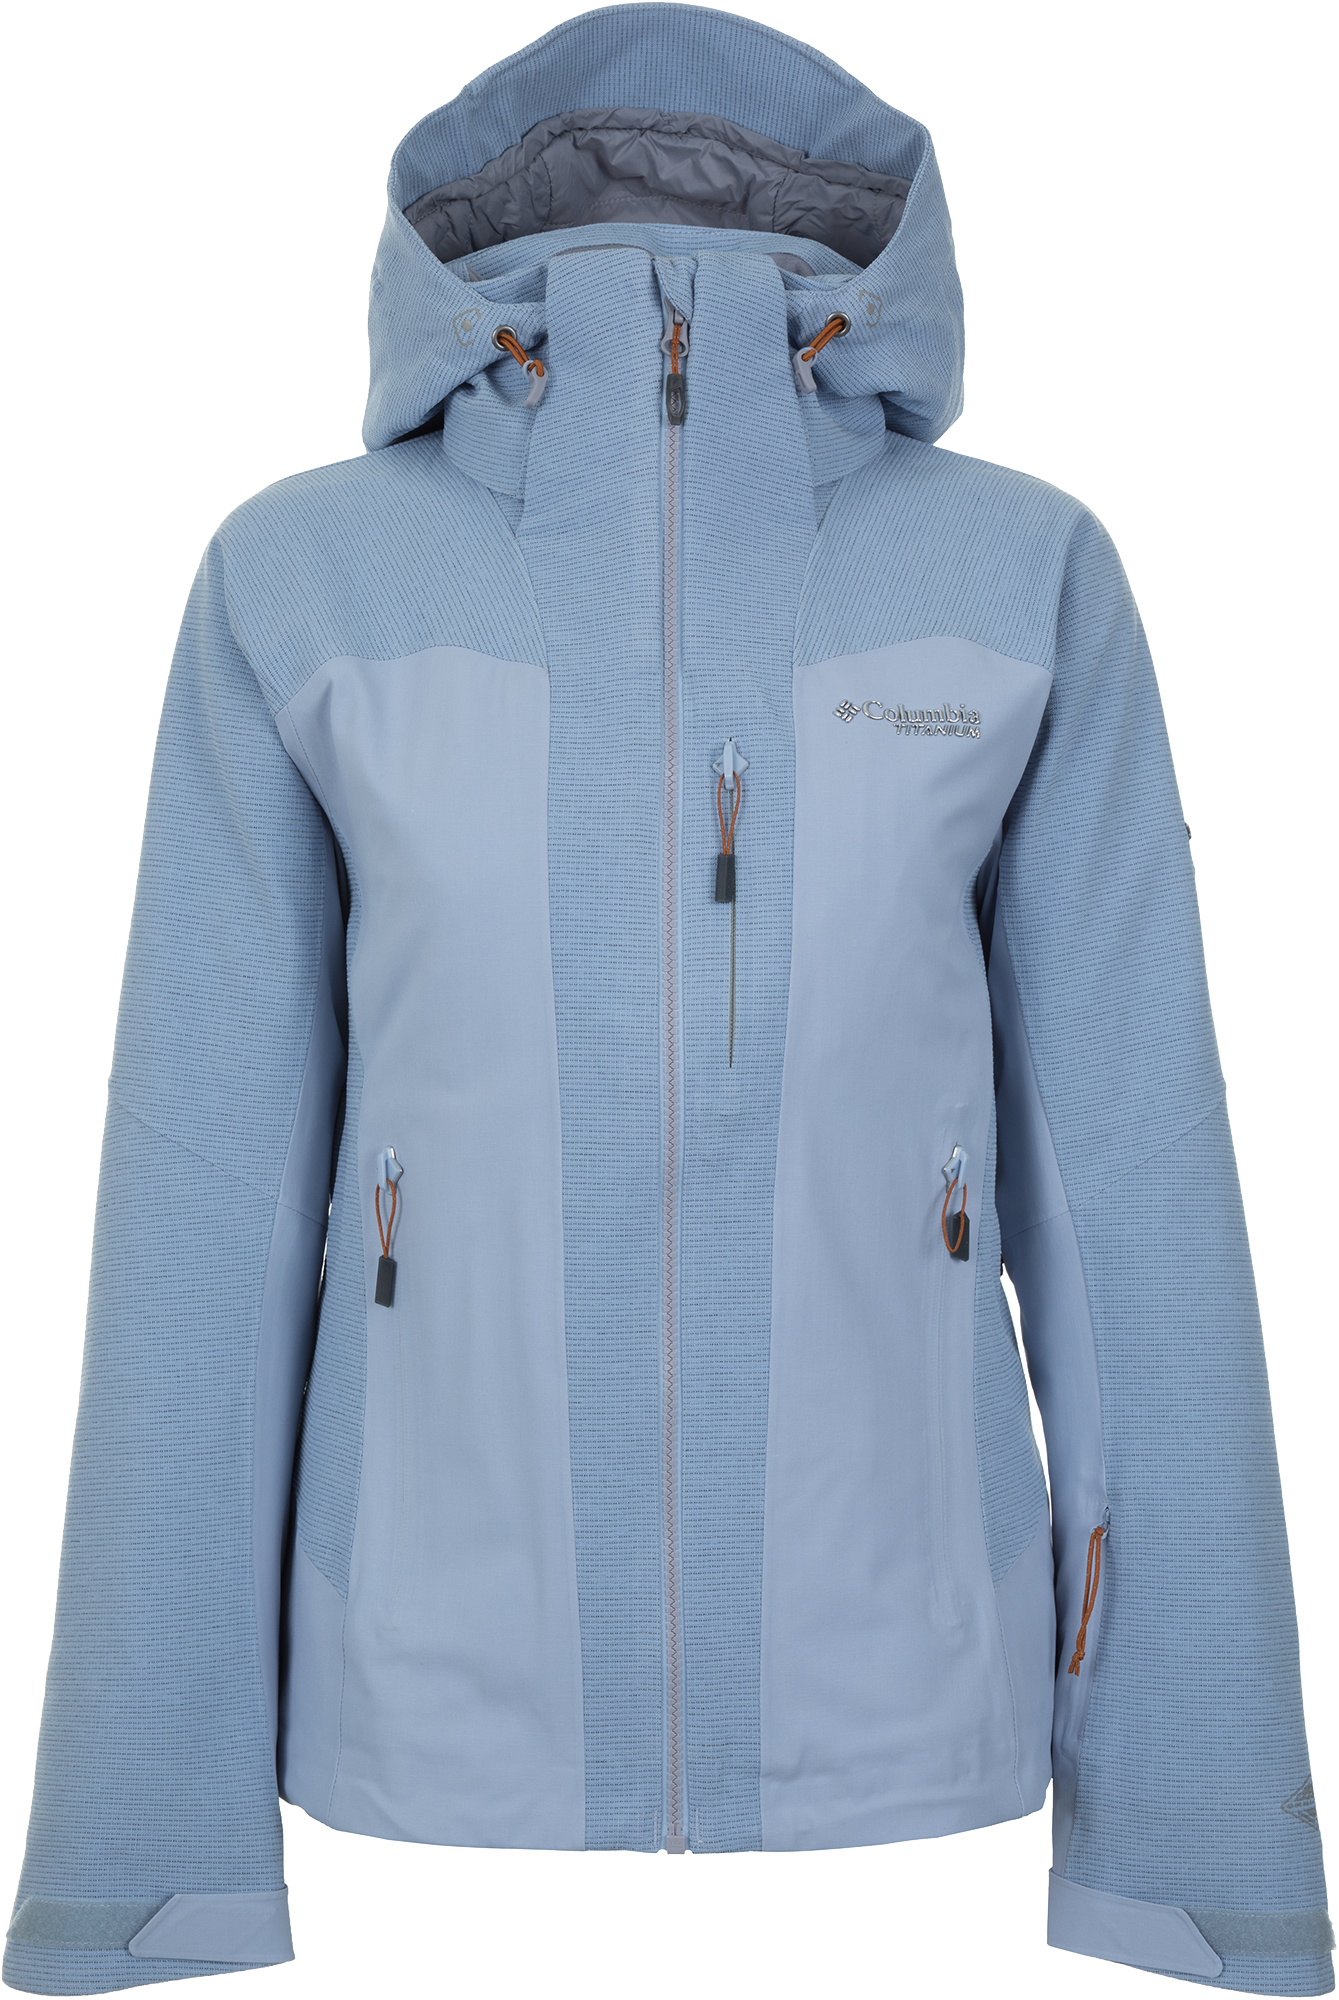 Columbia Куртка утепленная женская Columbia Powder Keg II, размер 50